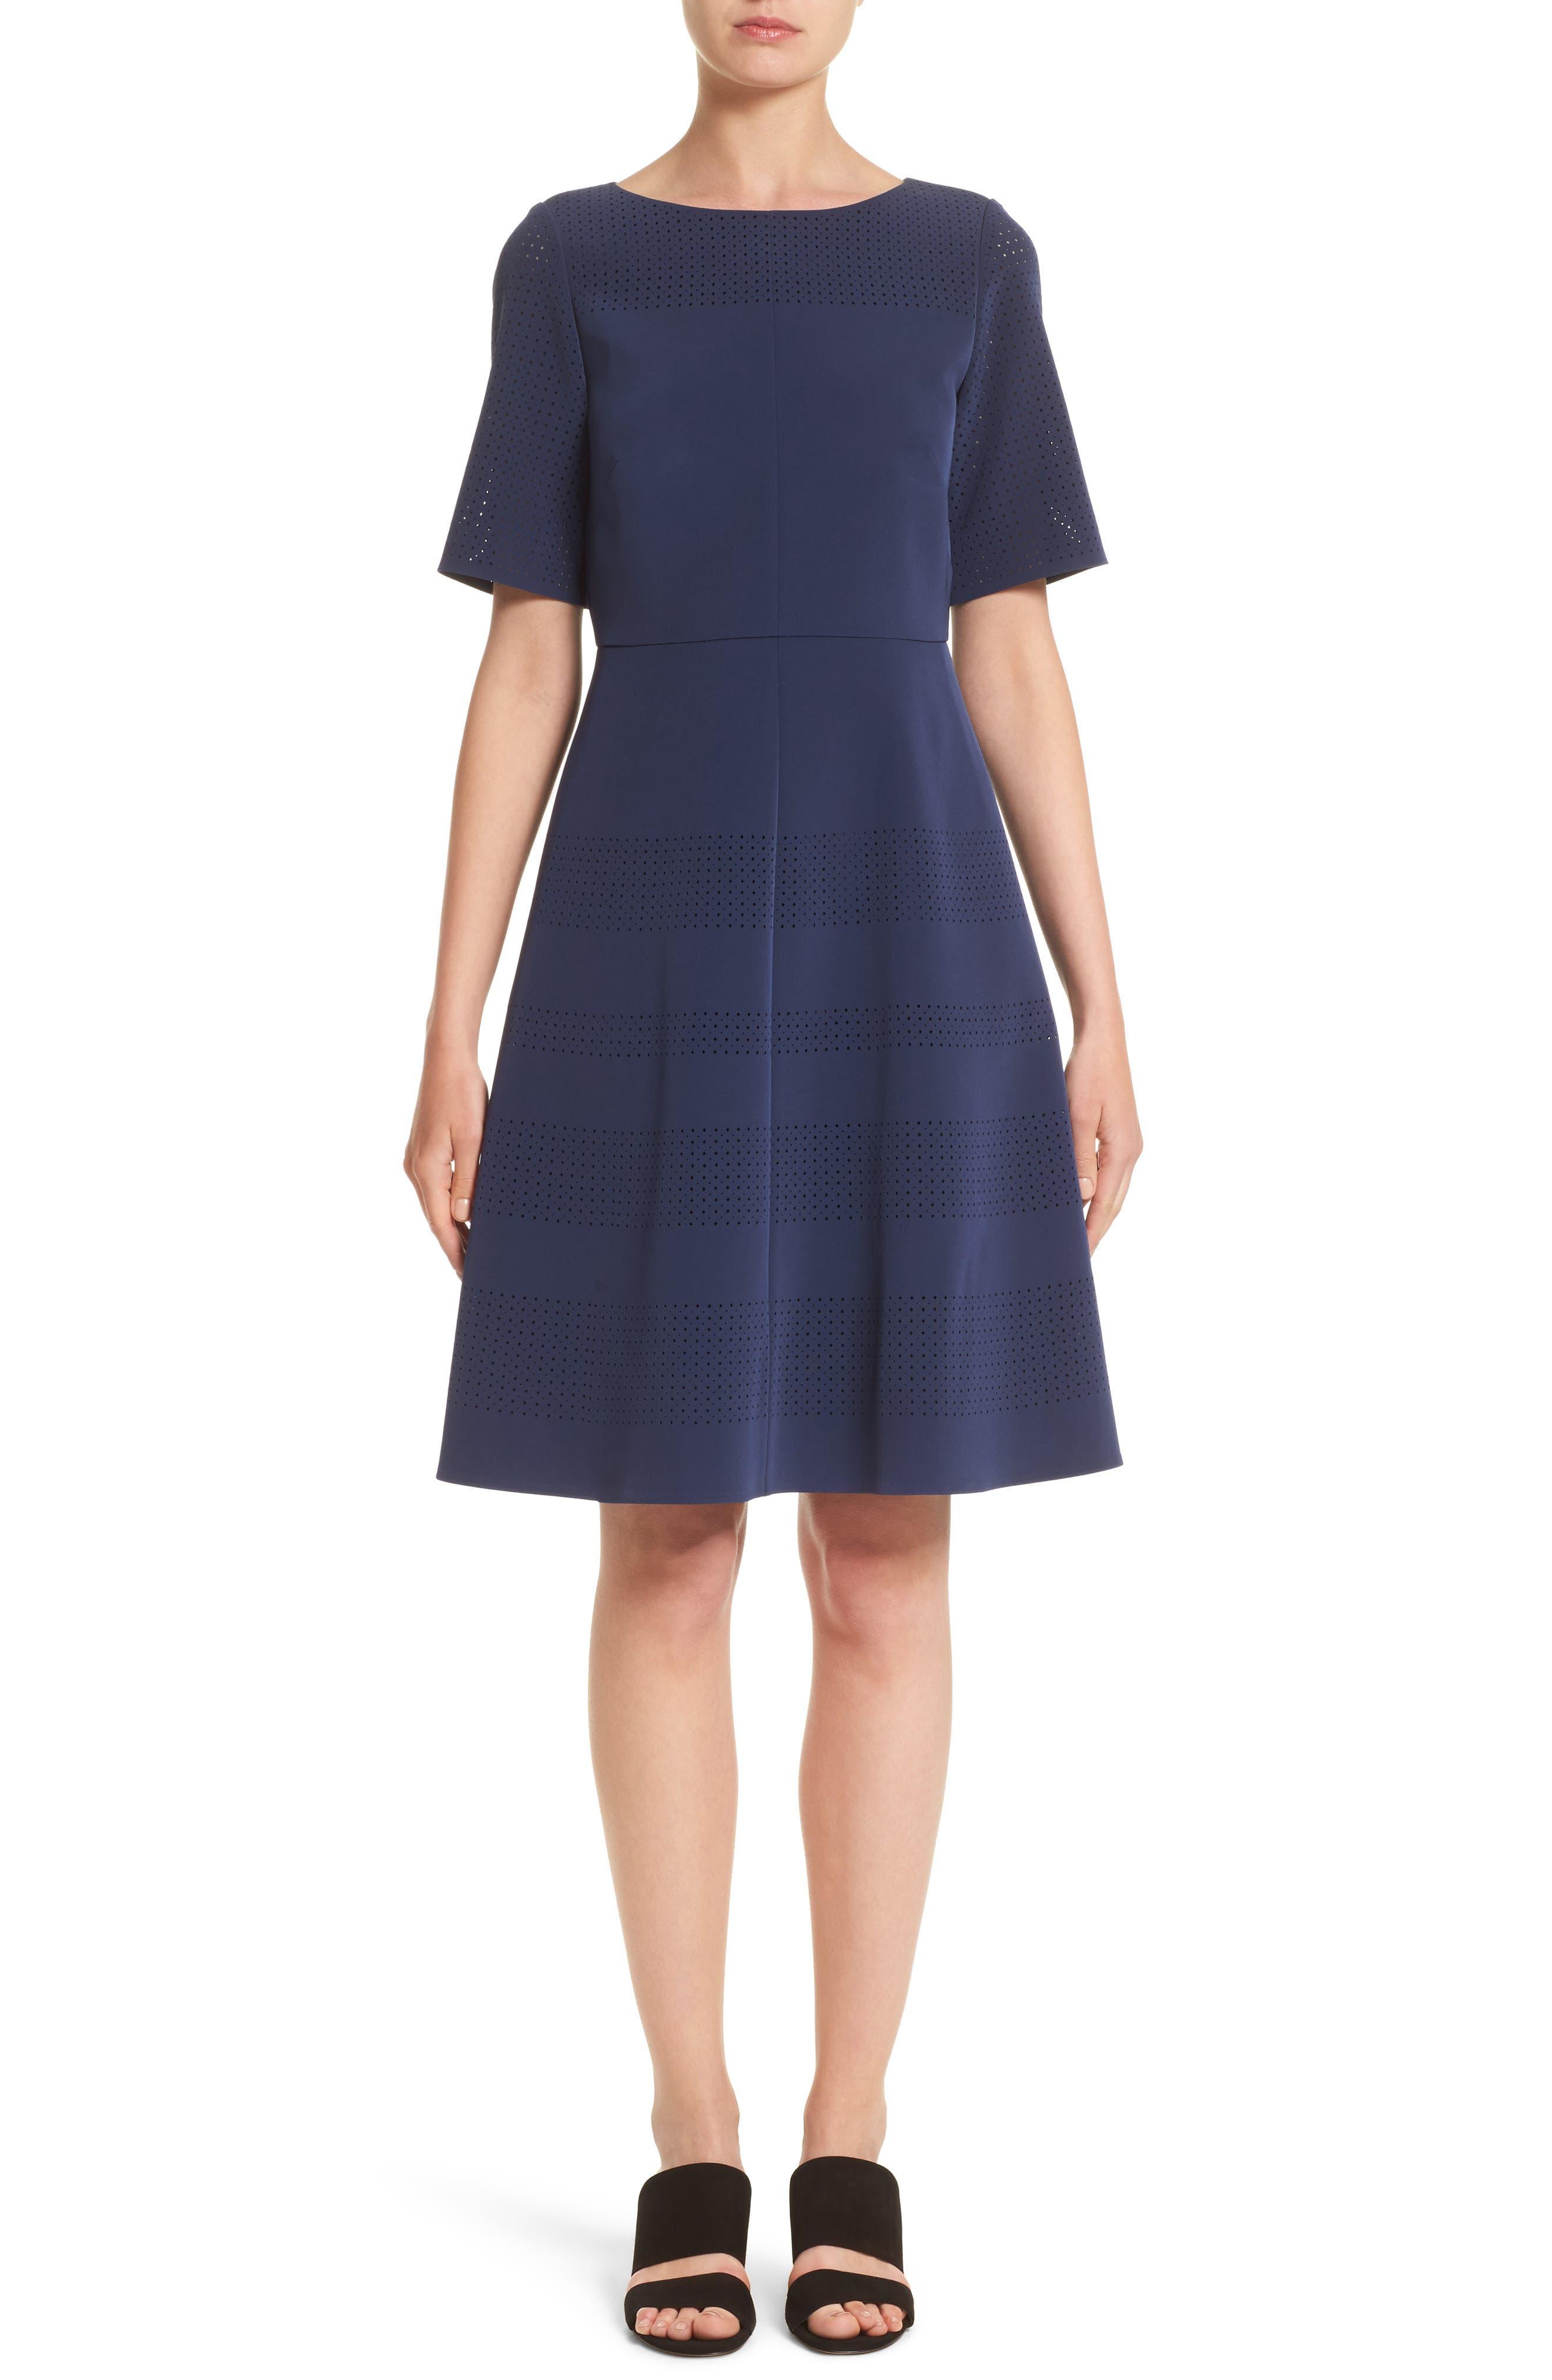 Tamera Perforated Fit & Flare Dress,                             Main thumbnail 1, color,                             Delft